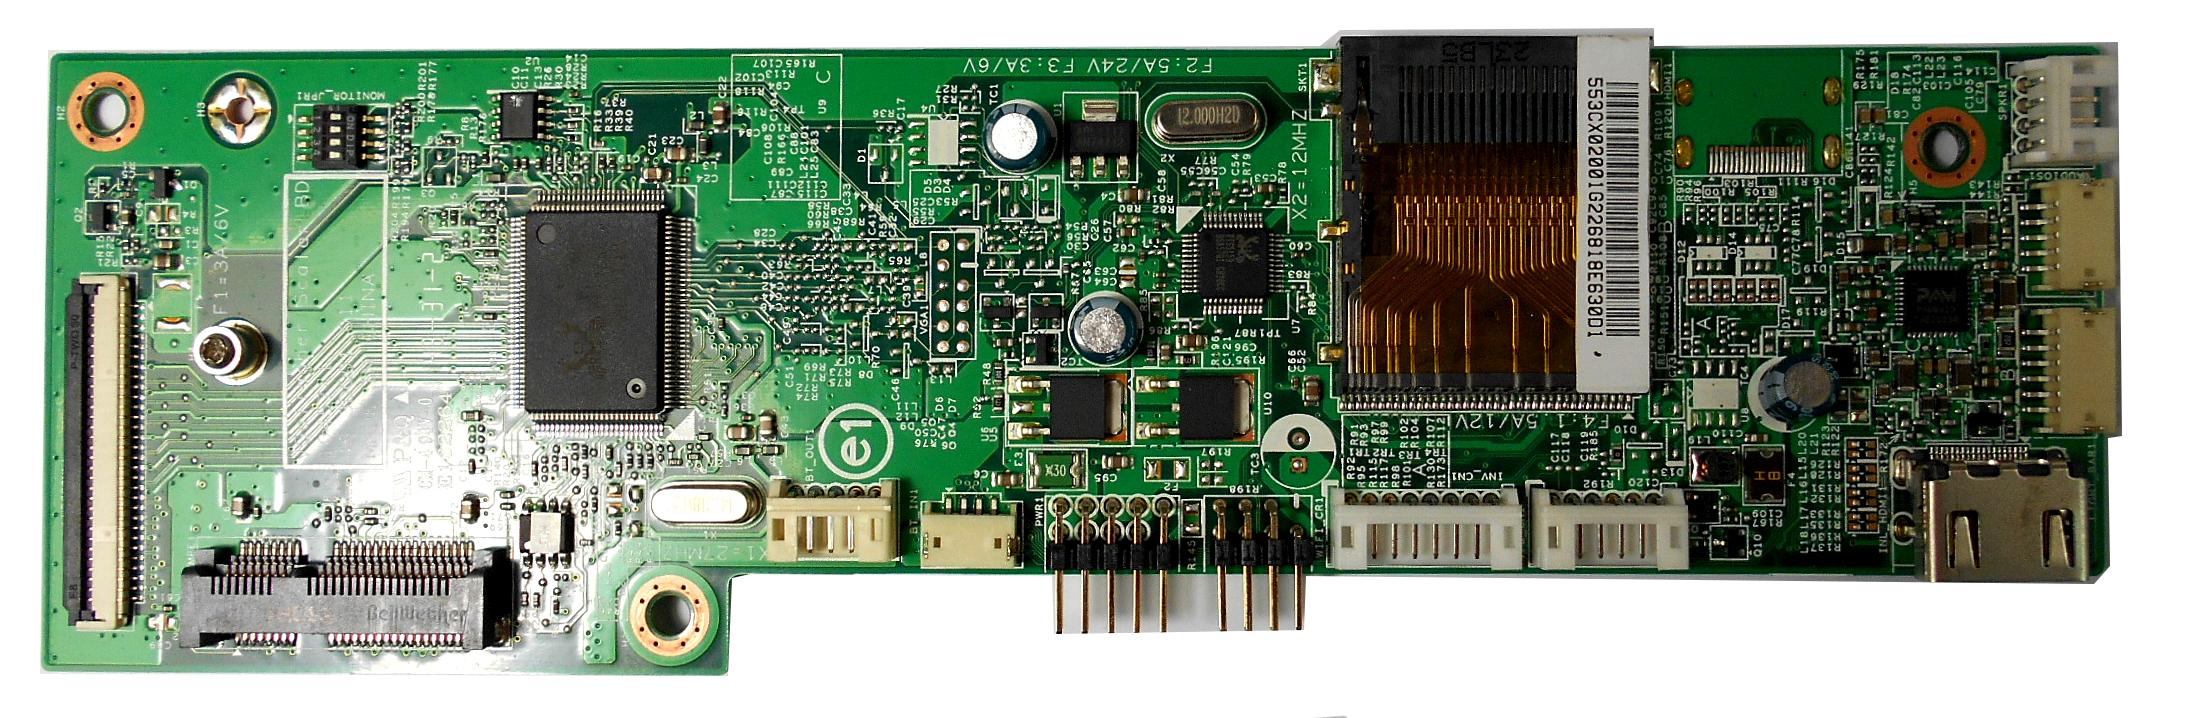 48.3DQ01.011 Acer Aspire AiO PC Scaler Board (vGallagher) - 10457-1